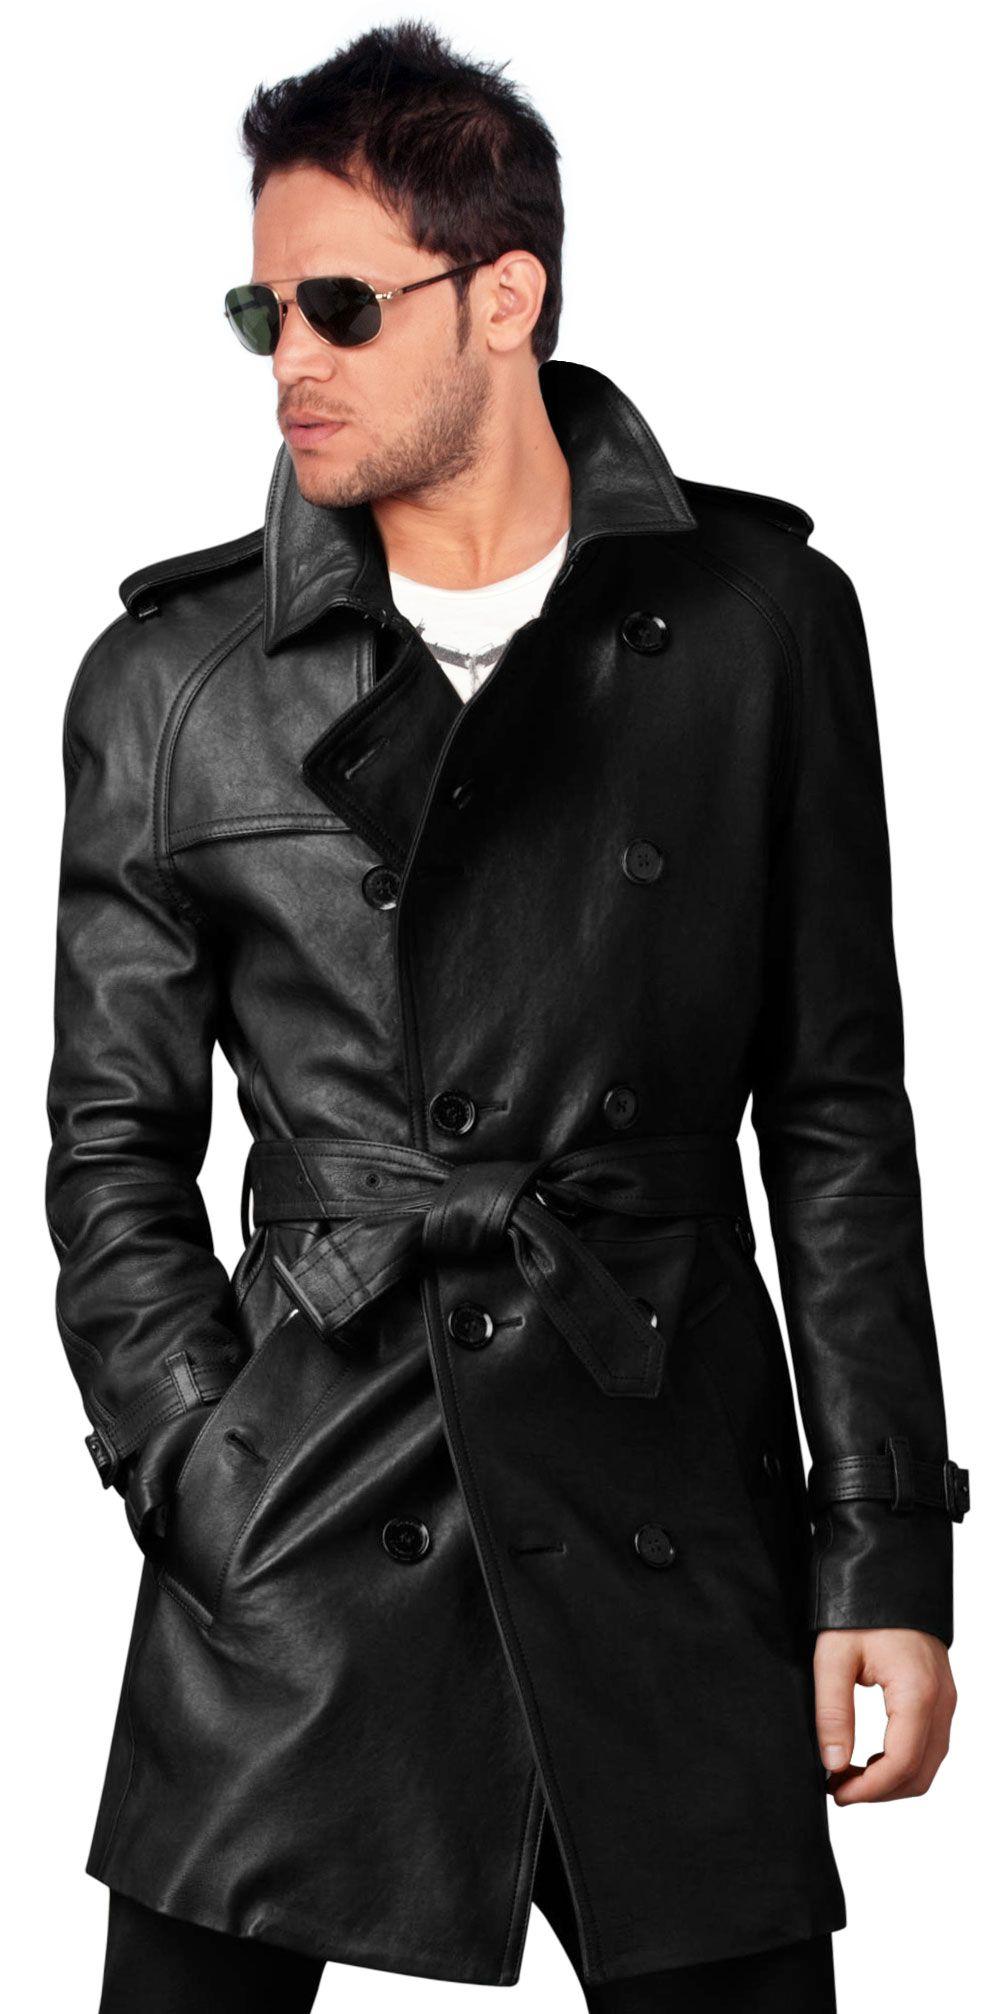 Buy raglan sleeved cozy mens leather trench coat online